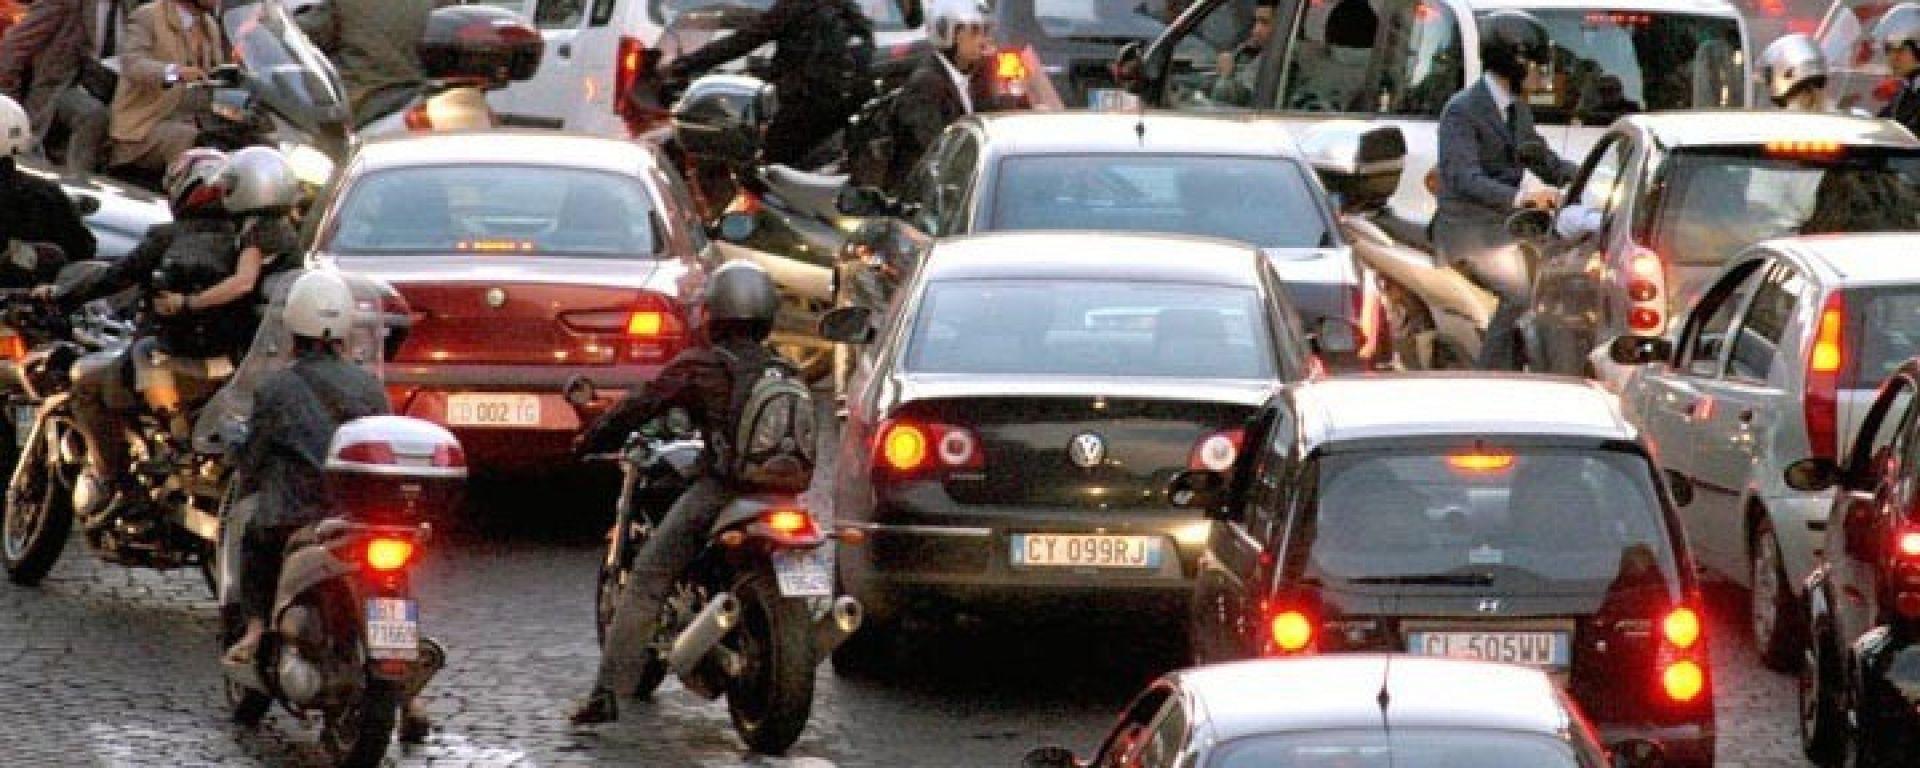 Traffico: stop alle moto Euro 0 e Euro 1 a Roma